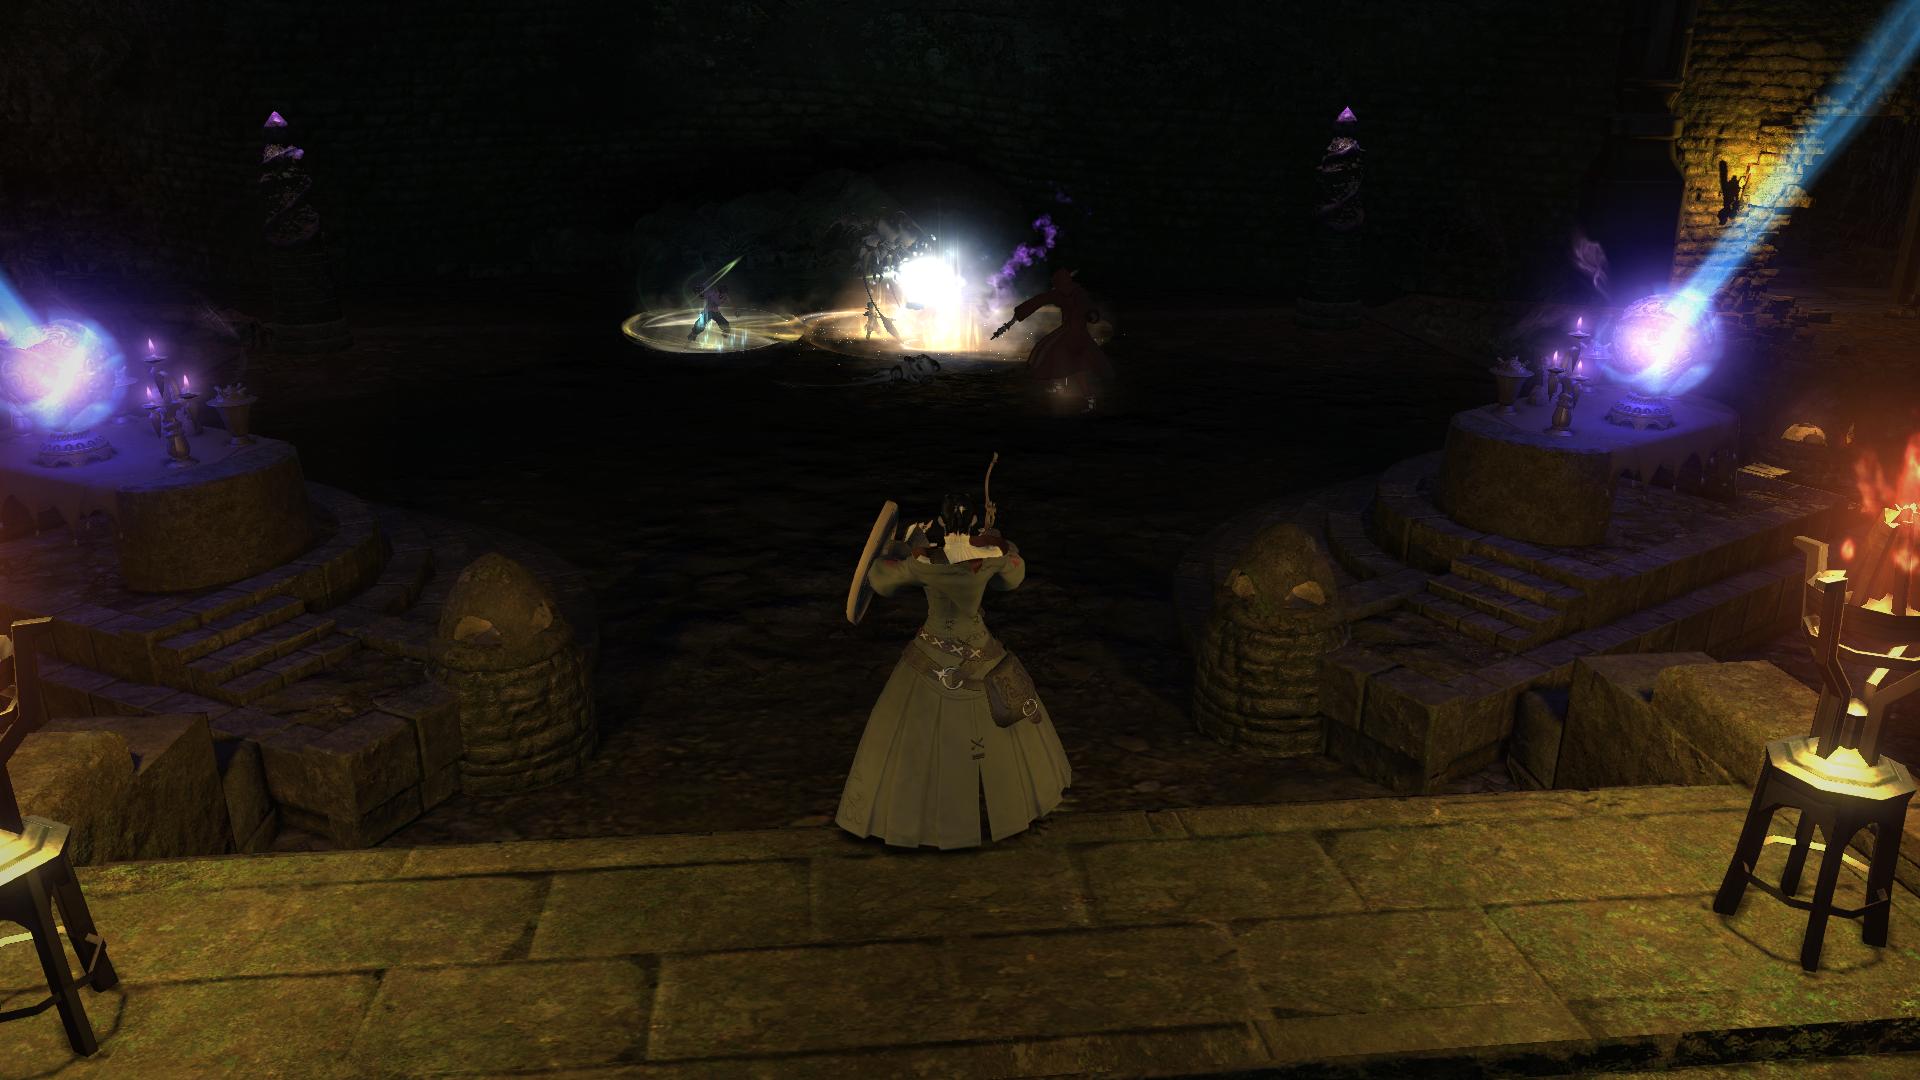 shidobu ffxiv limsa through tonight well screenshots lifted phase beta